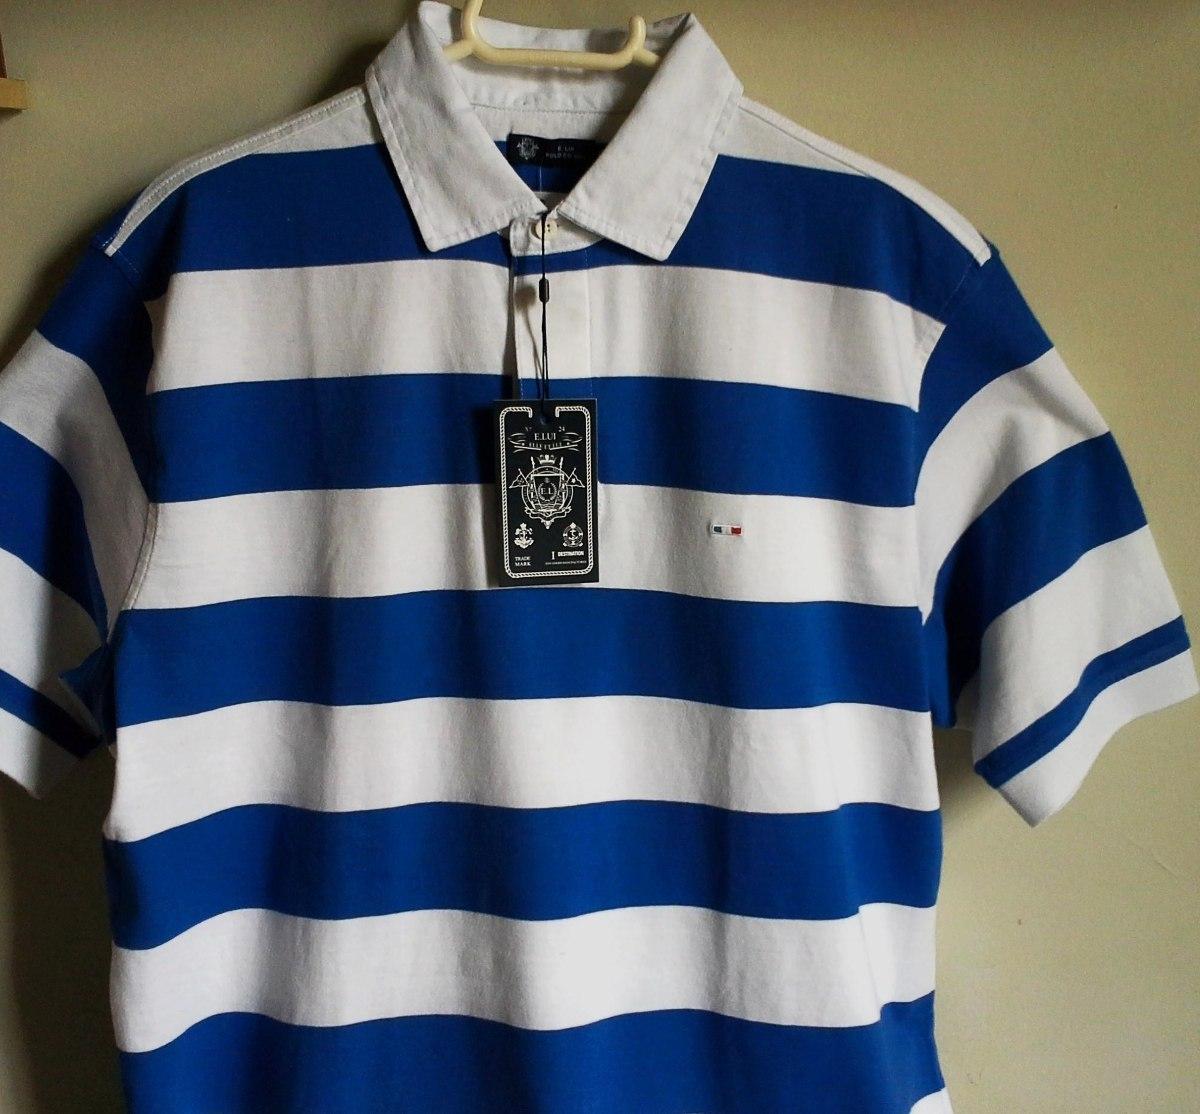 camisa polo masculina elle et lui azul  branco tm m   g. Carregando zoom. 36d78fdf9c2b1